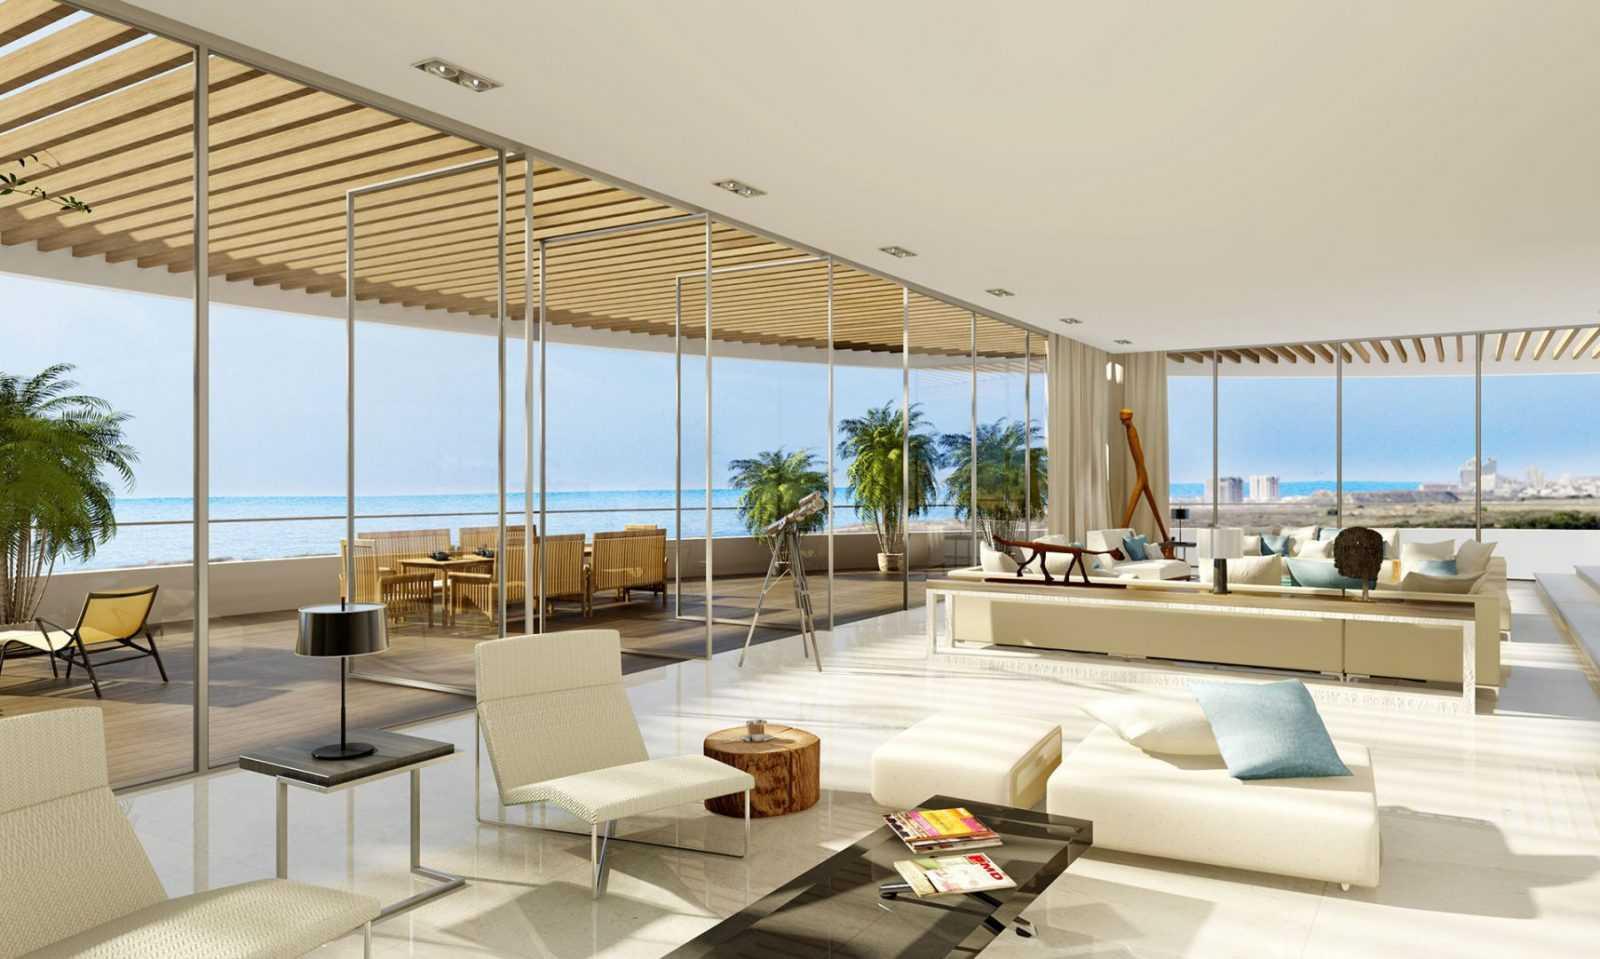 Luxurious-Penthouse-for-sale-in-Tel-Aviv-B-(1)